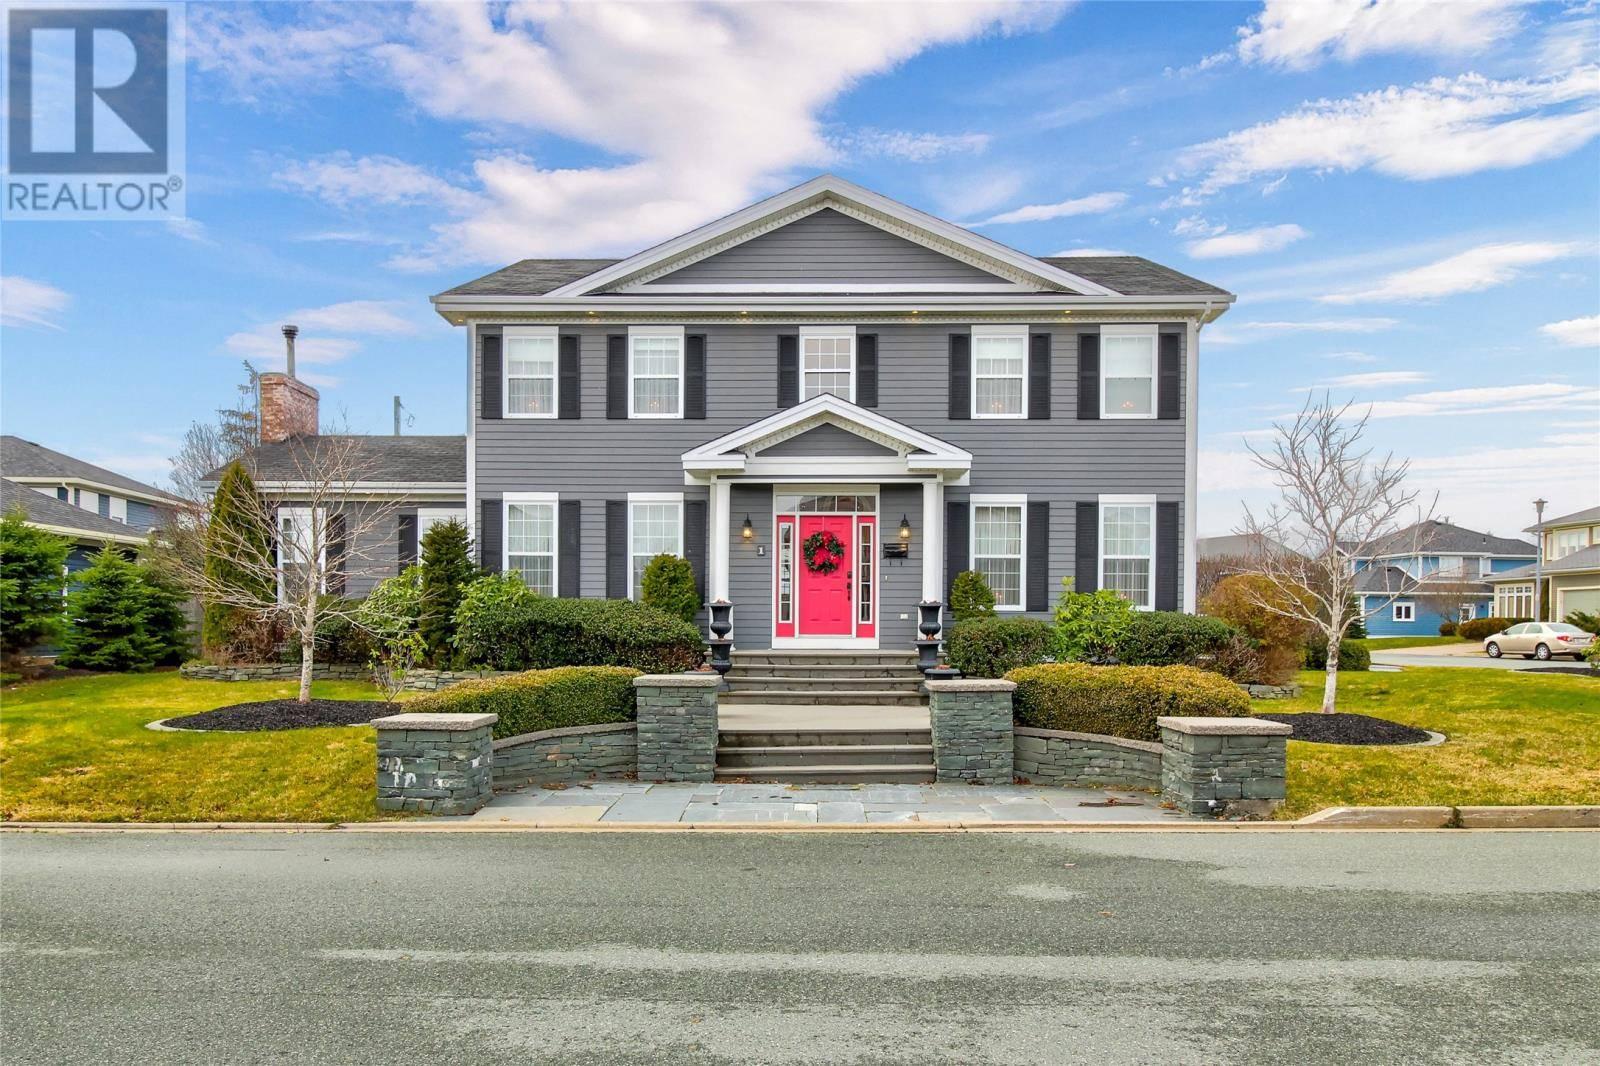 House for sale at 1 Hebbard Pl St. John's Newfoundland - MLS: 1207689